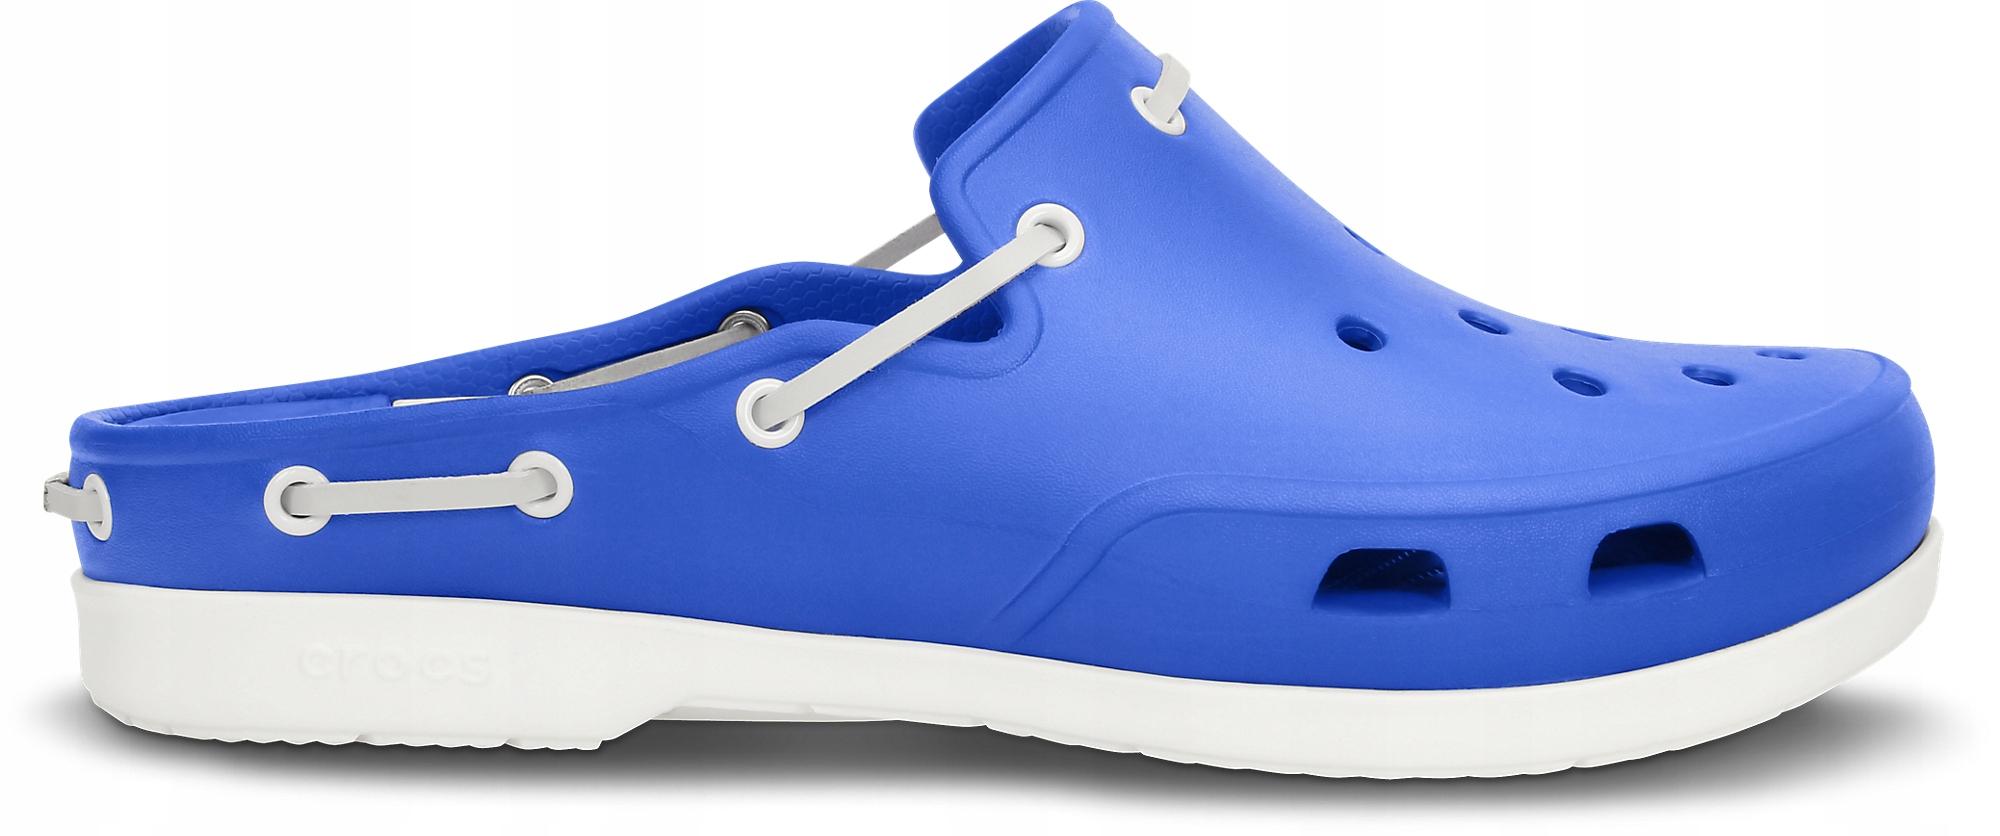 Crocs Clog beach line niebieskie M12 (46-47)